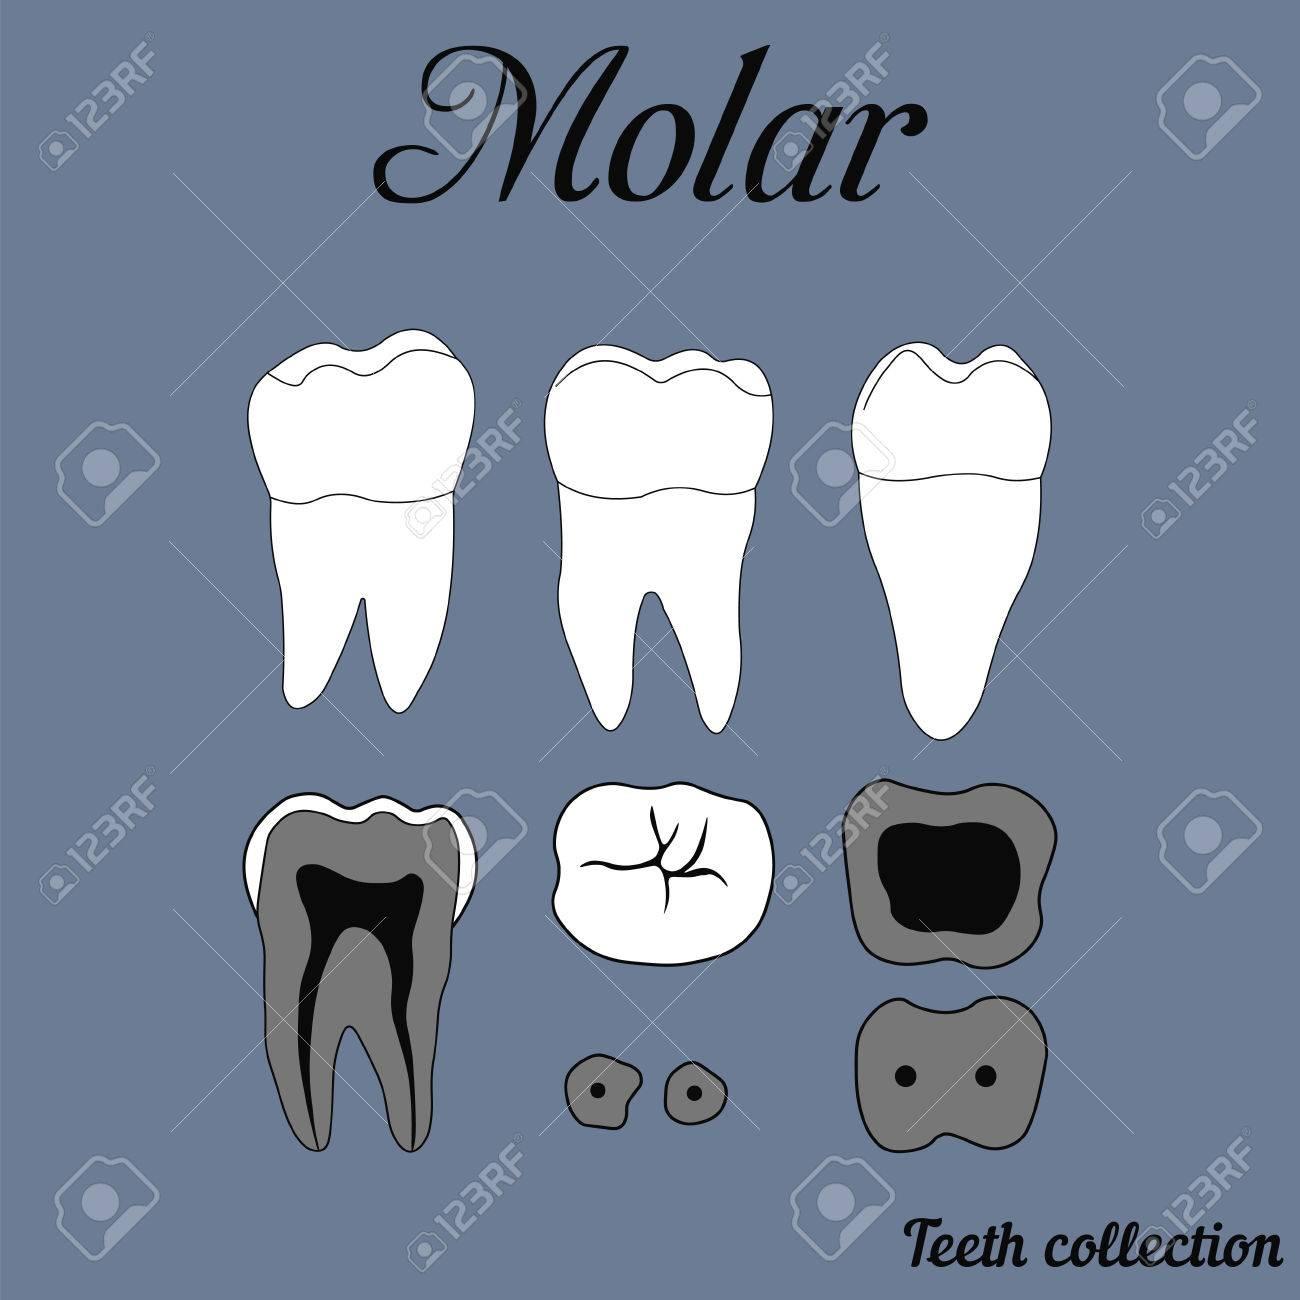 Human Tooth - Molar - Tooth Anatomy - Dentine, Enamel, Pulp ...